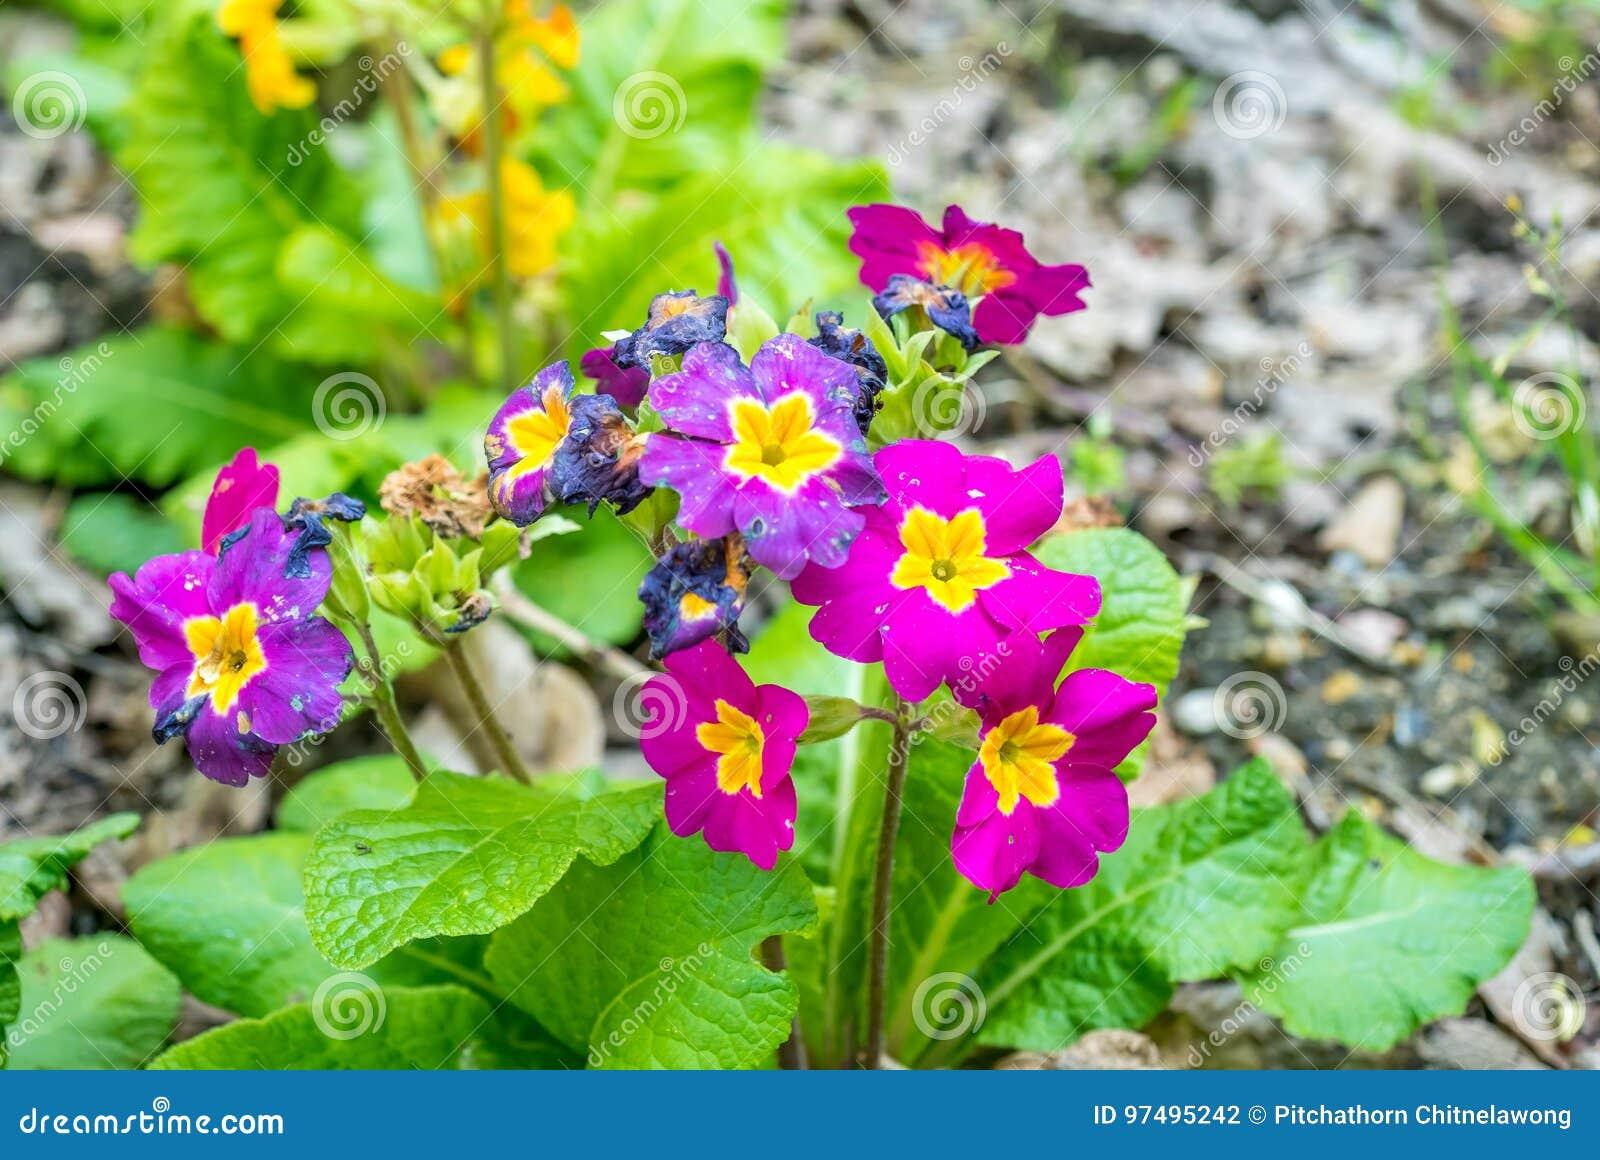 Fiori rosa in giardino verde